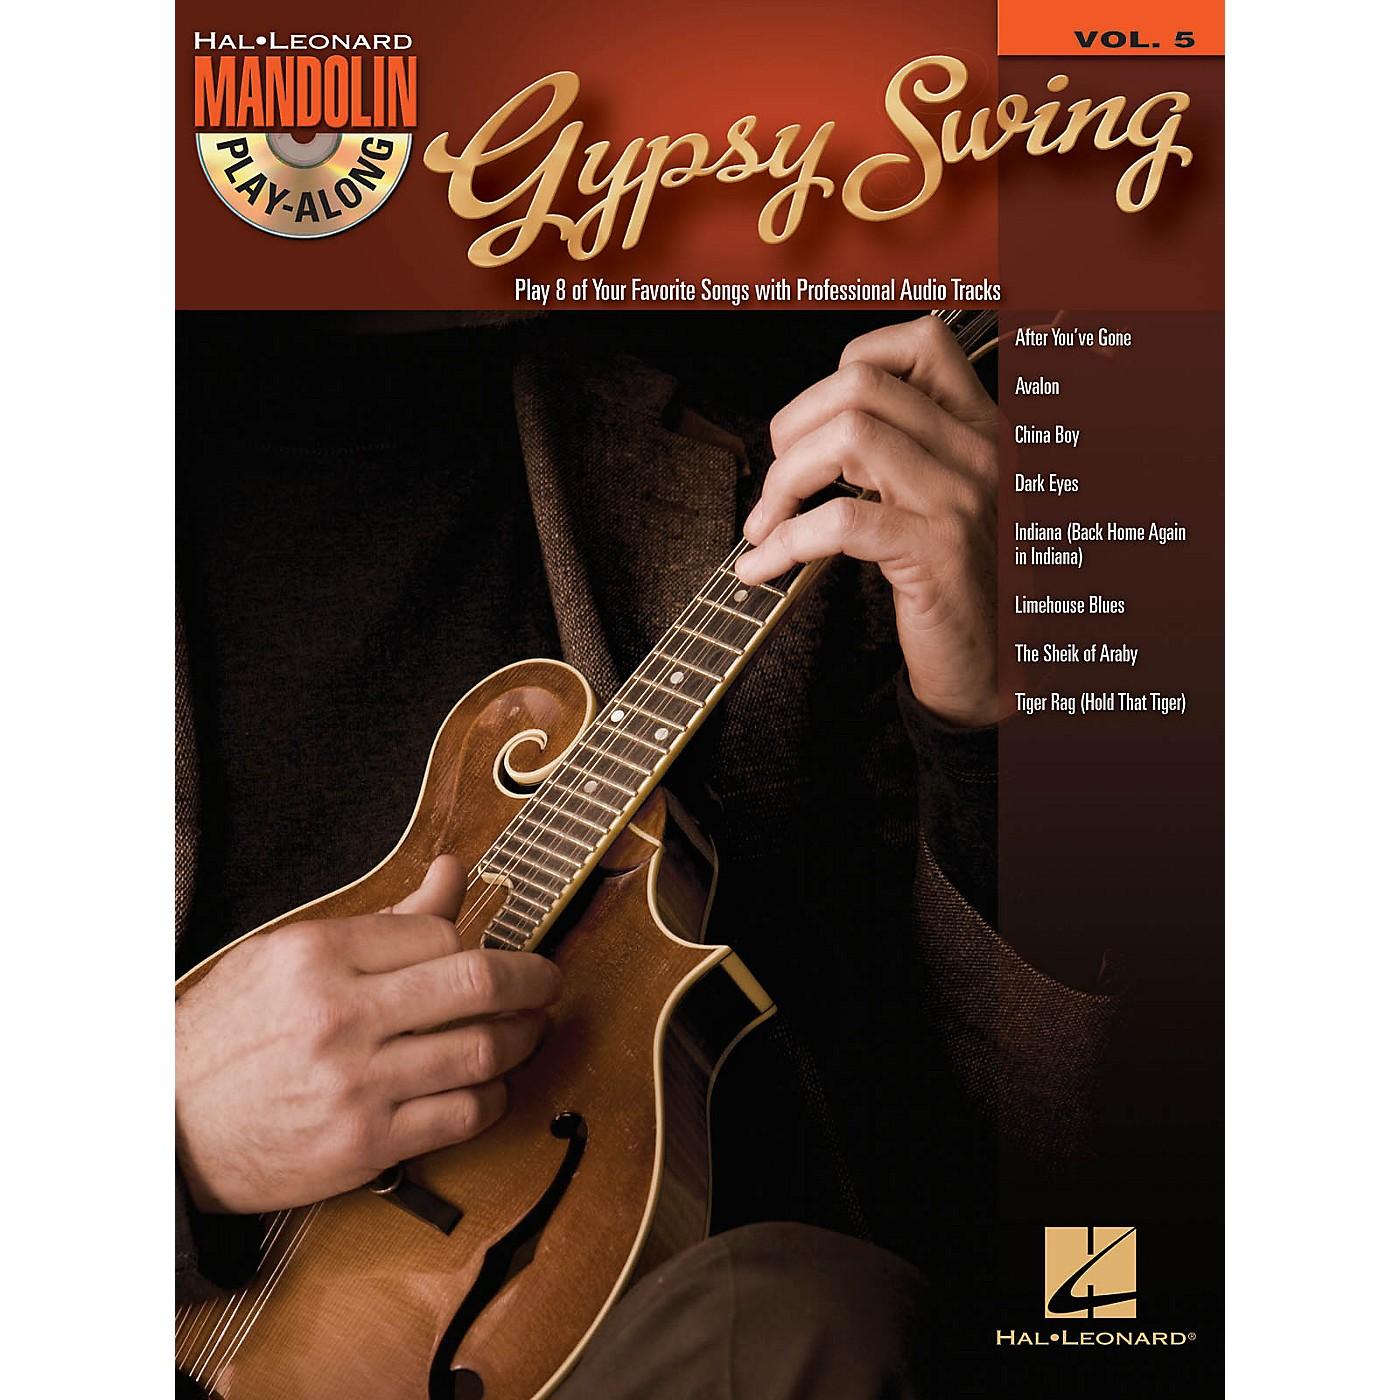 Hal Leonard Gypsy Swing (Mandolin Play-Along Volume 5) Mandolin Play-Along Series Softcover with CD thumbnail